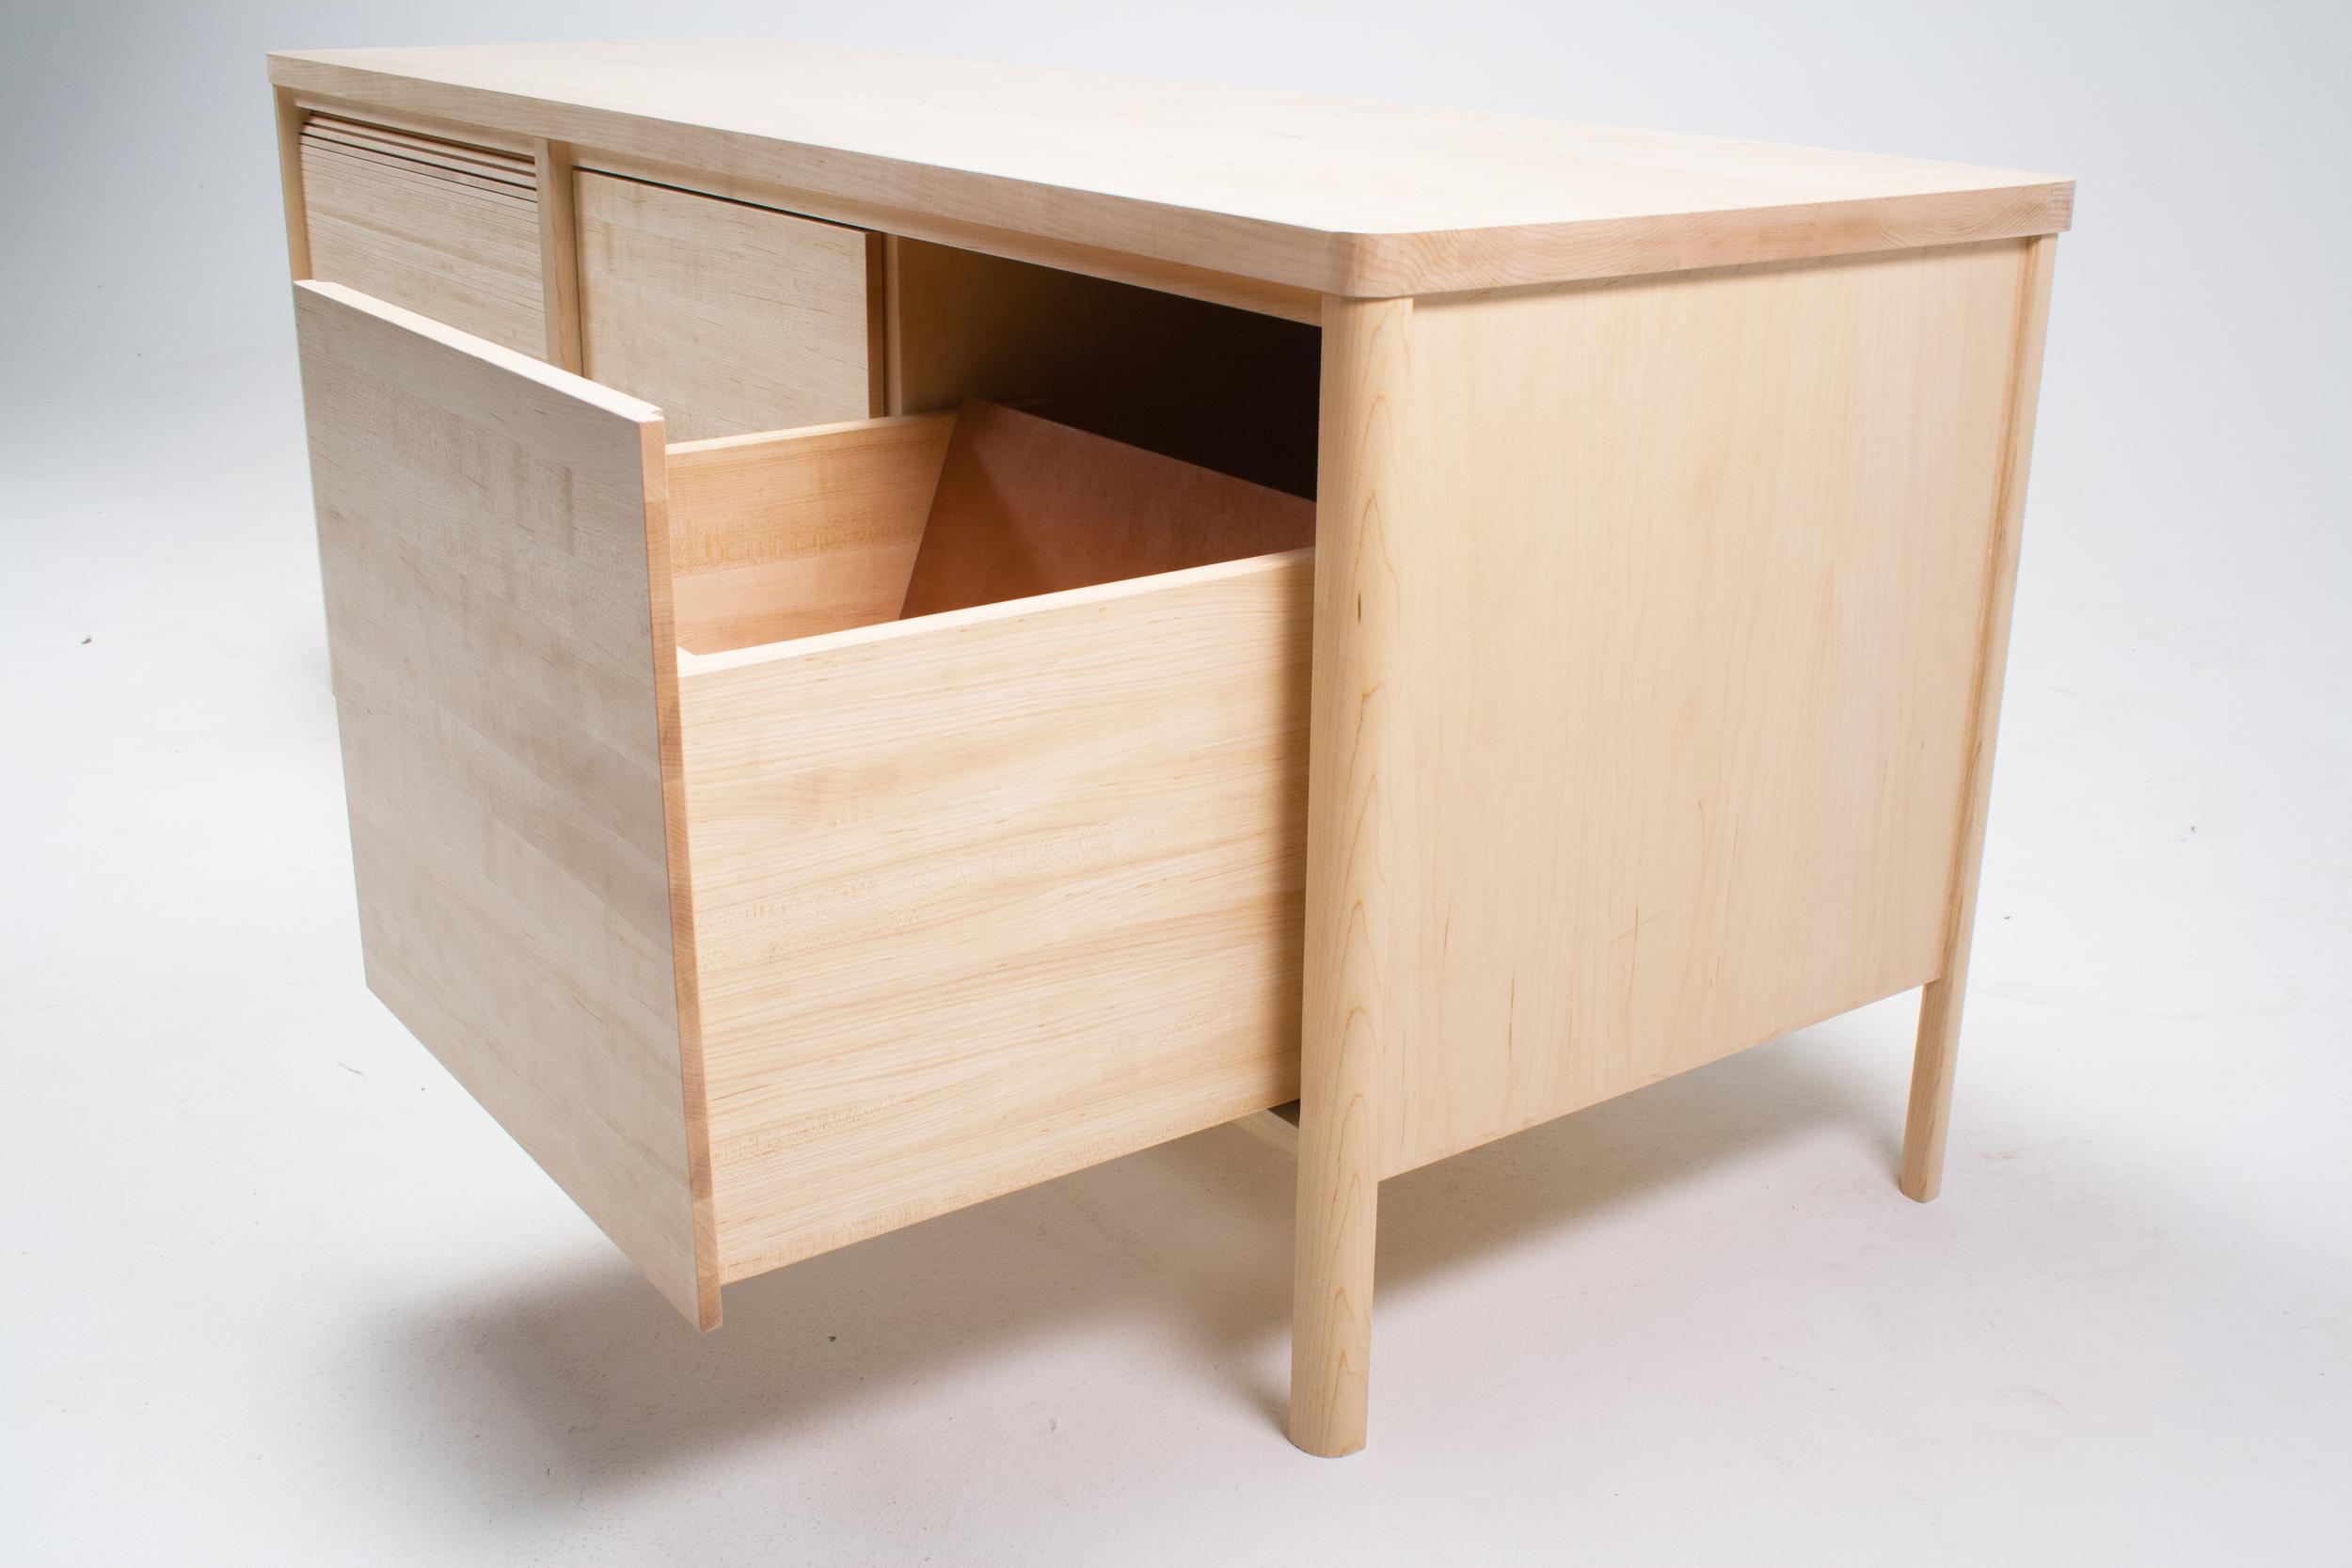 reed cabinet three quarter drawer.jpg